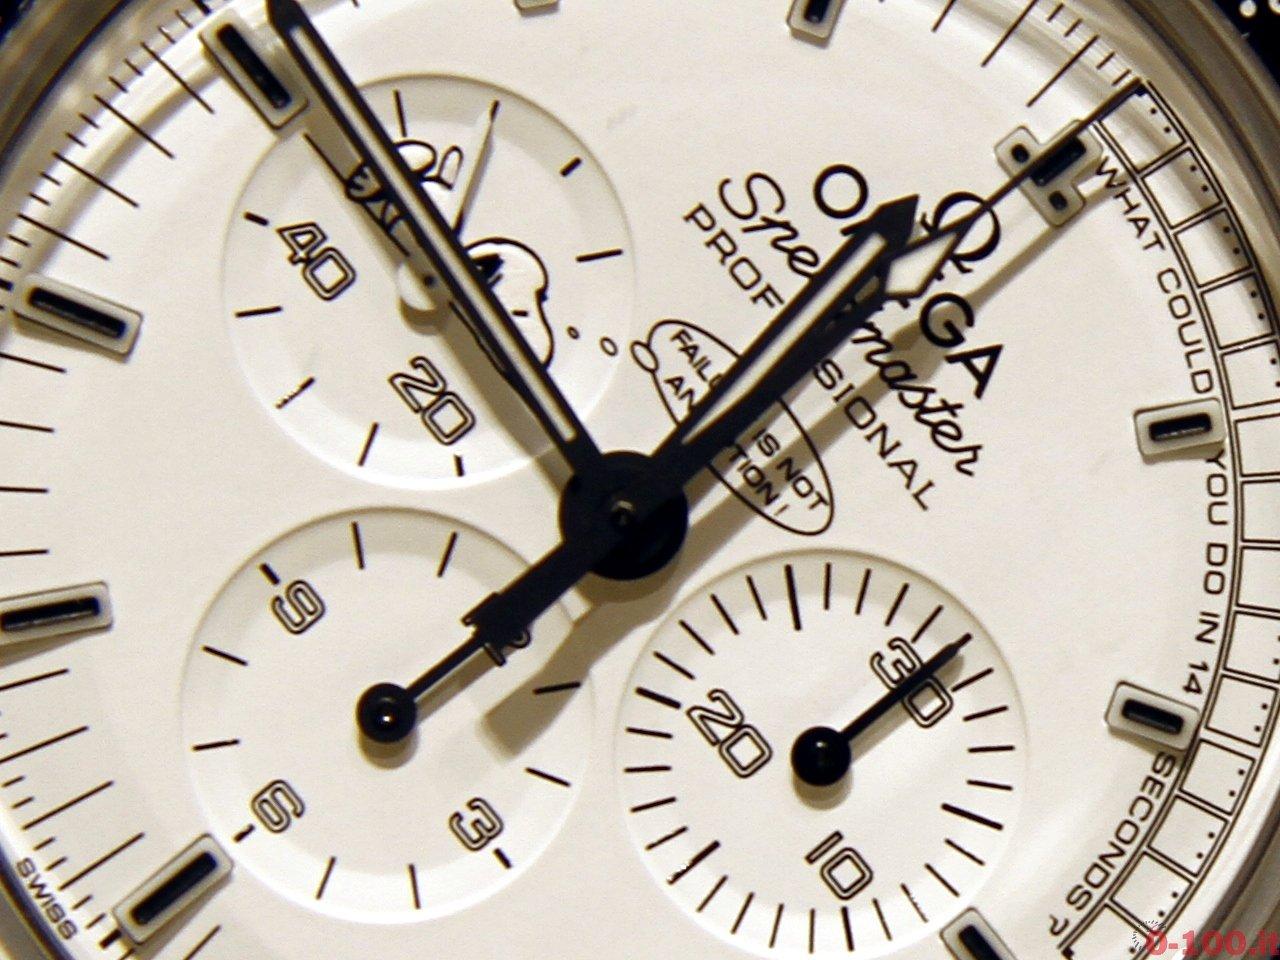 baselworld-2015-omega-speedmaster-moonwatch-apollo-14-snoopy-0-100_4